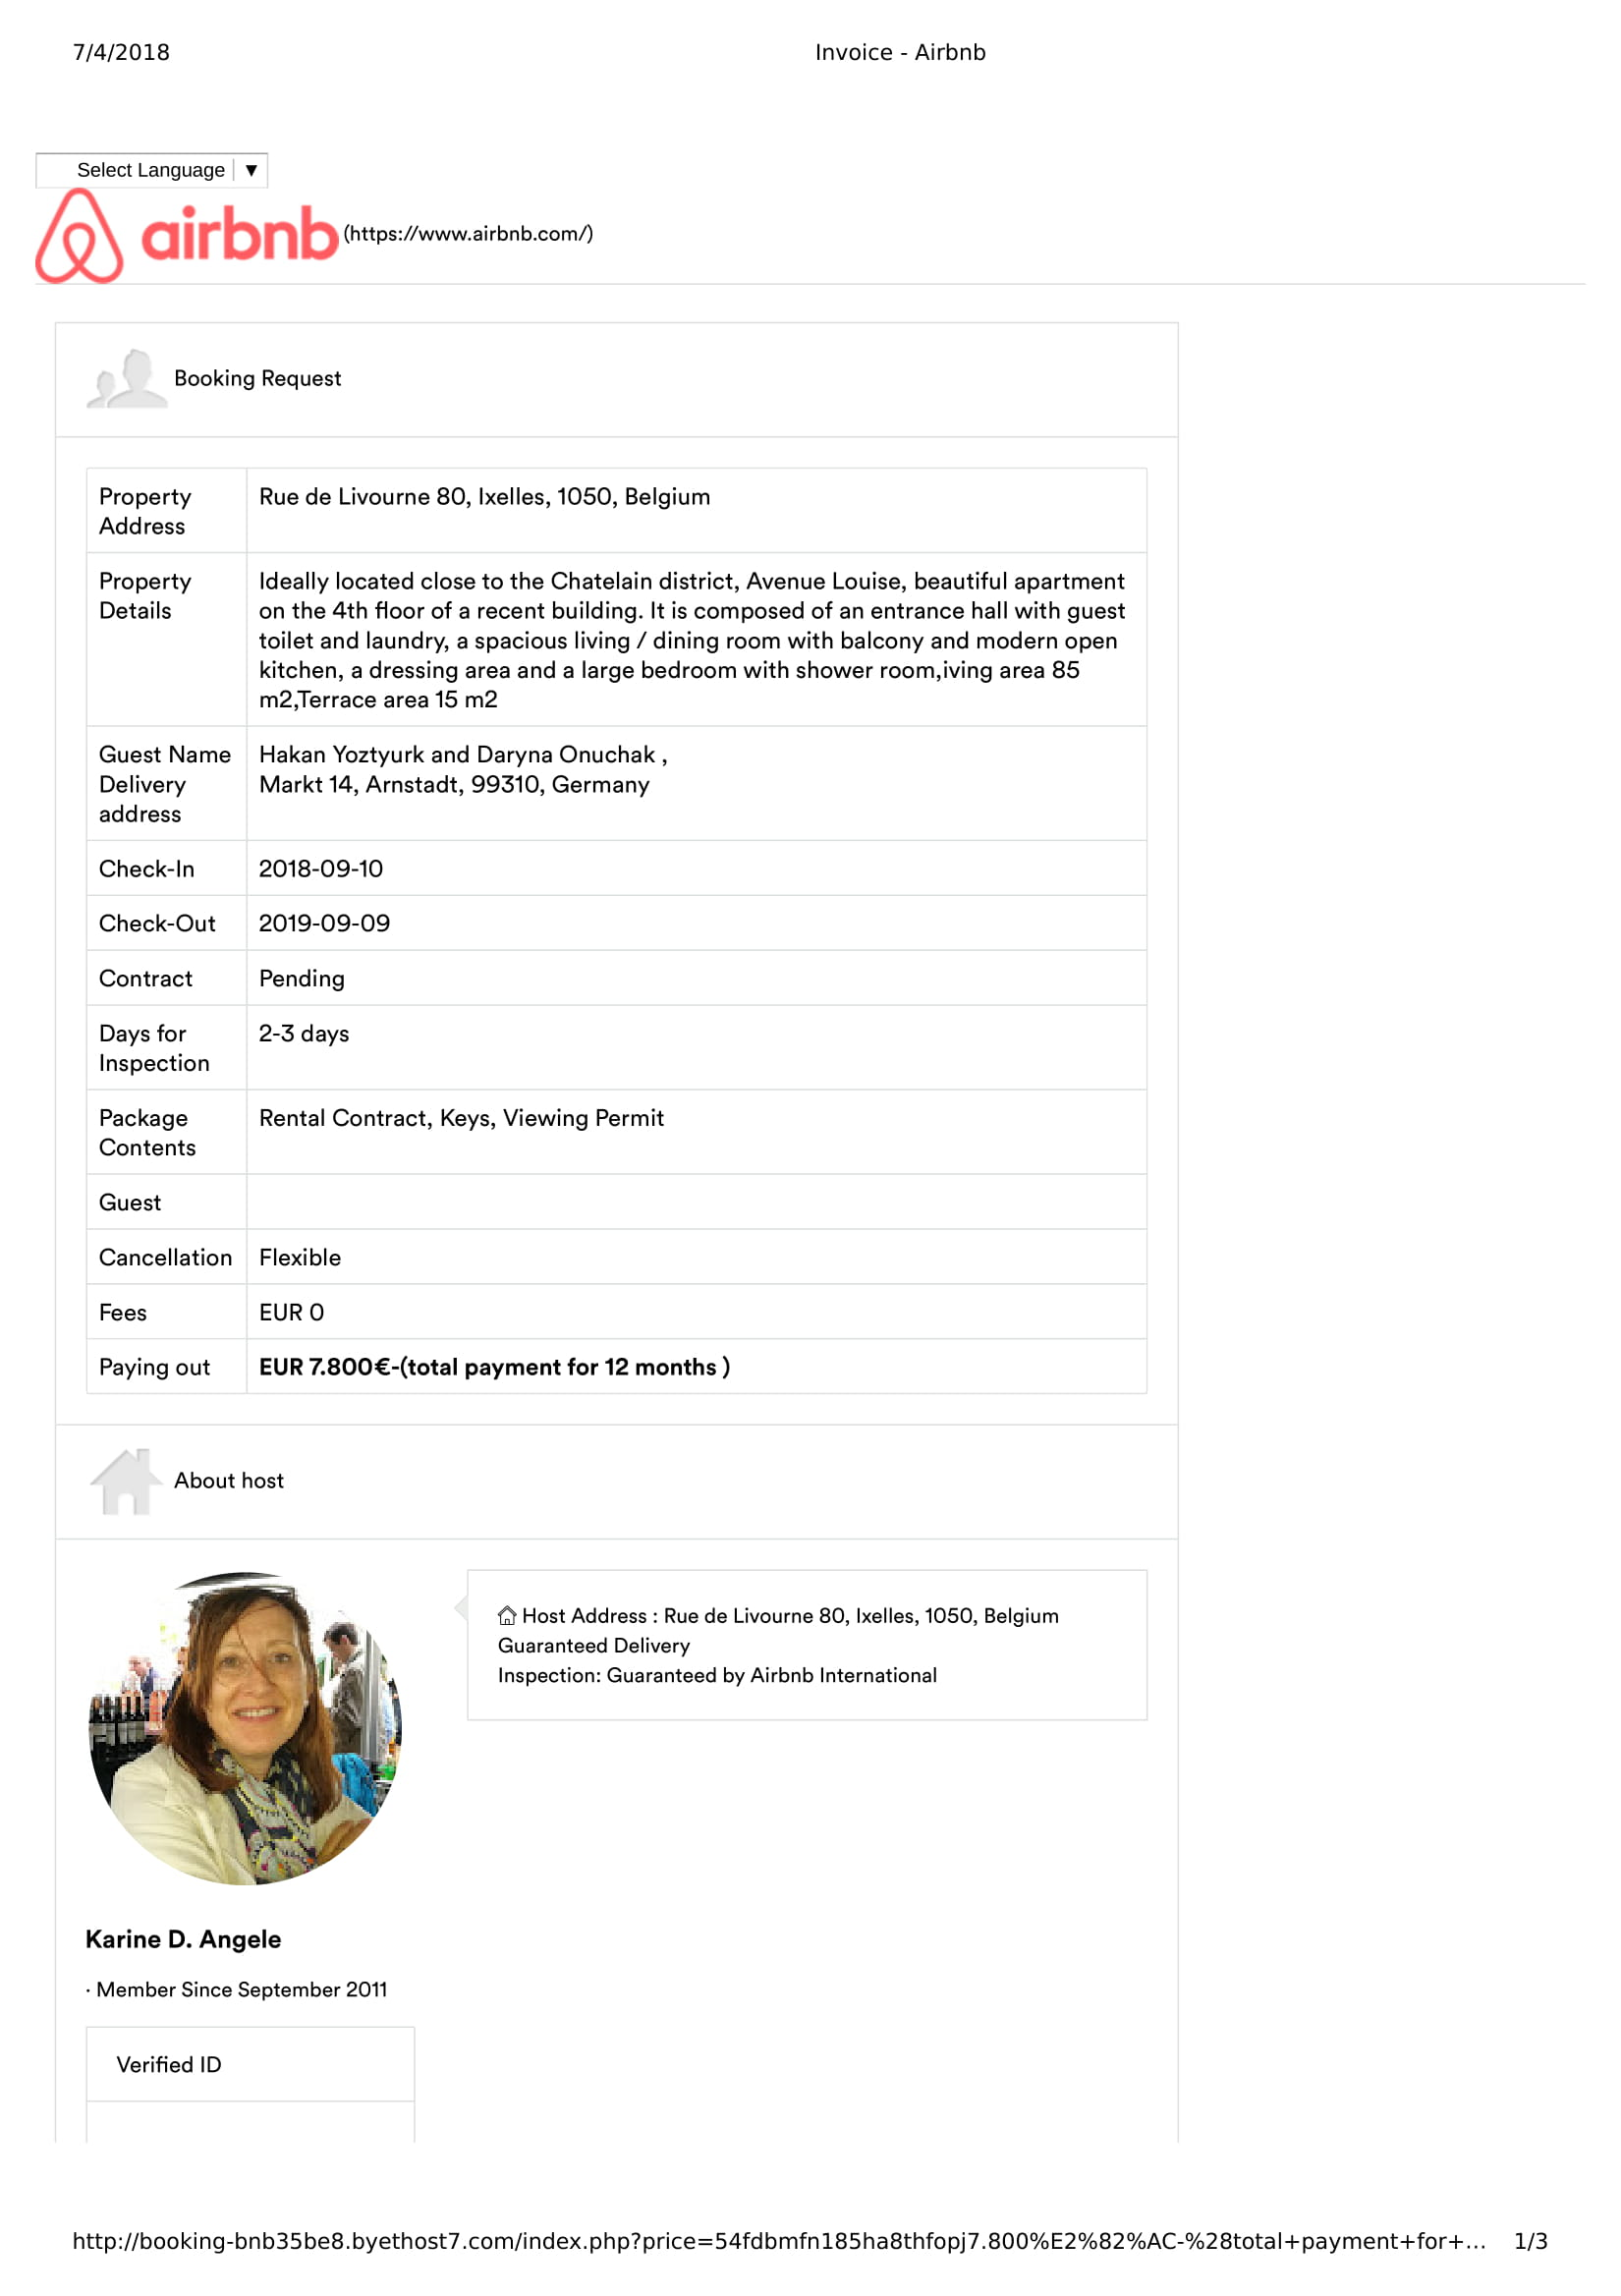 Invoice Airbnb Airbnb Community Invoice novelty georgekennebrewshow com